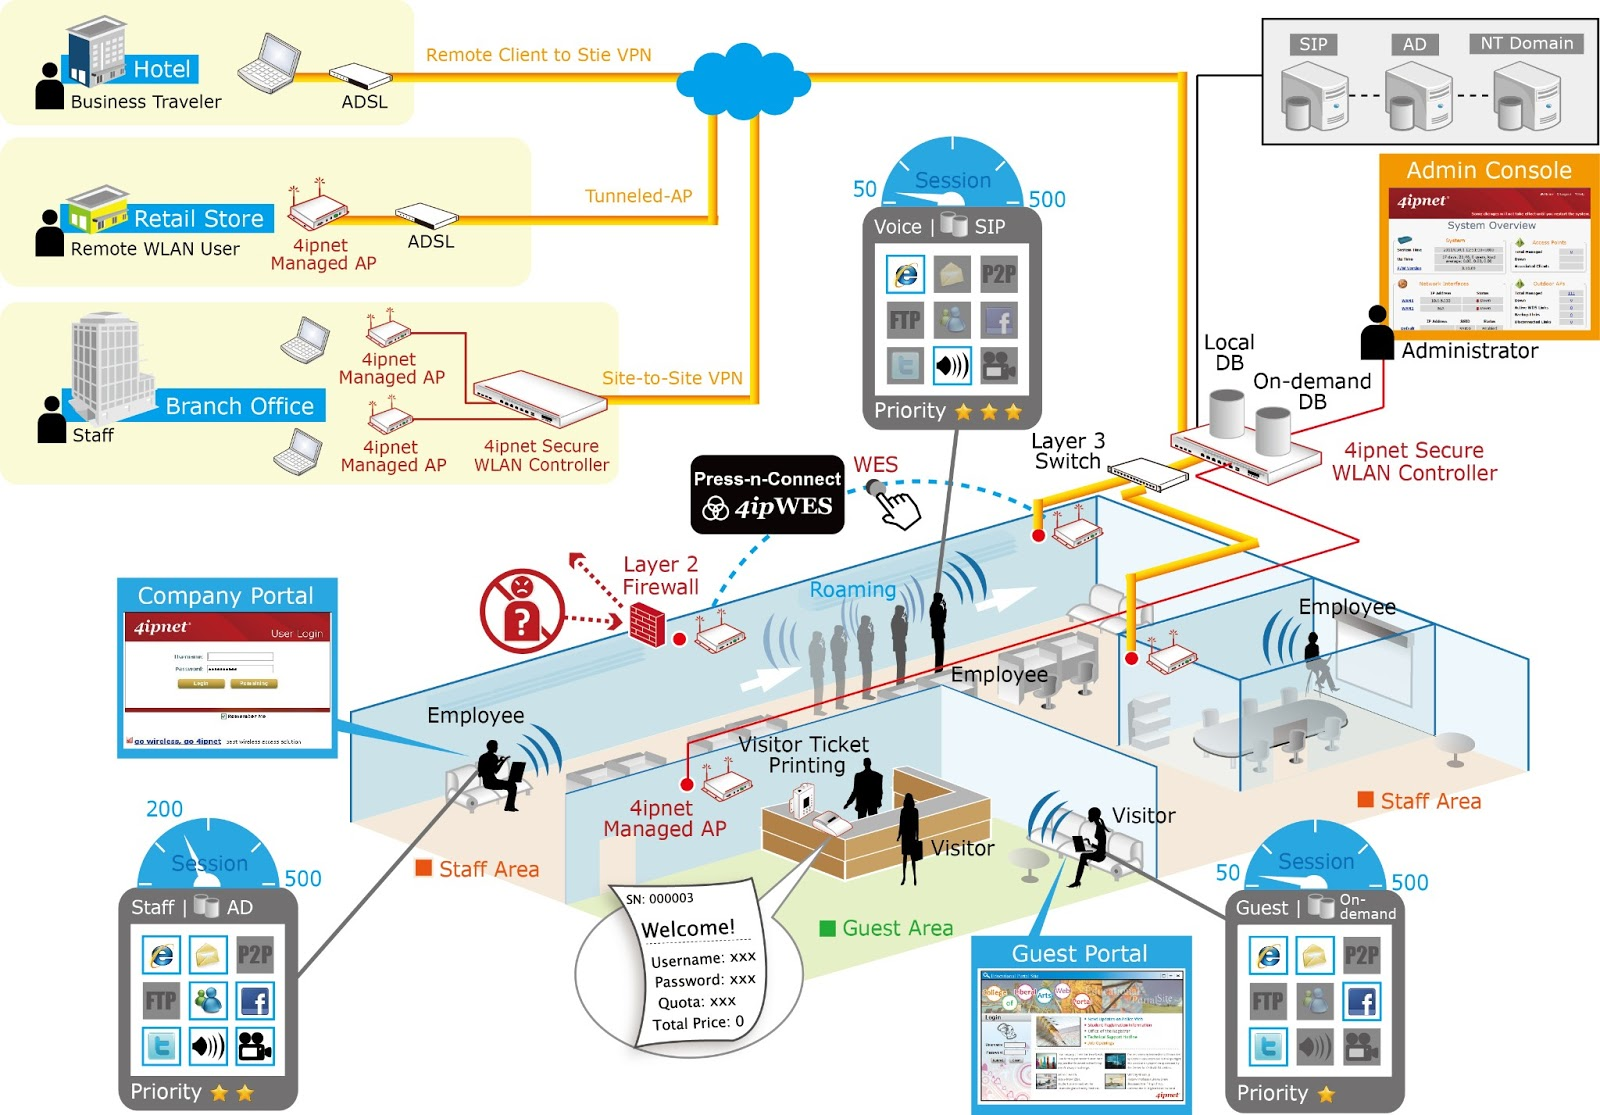 Wireless Enterprise Network Diagram Reinvent Your Wiring Netowrk 4ipnet Wlan Rh Blogspot Com Examples Architecture